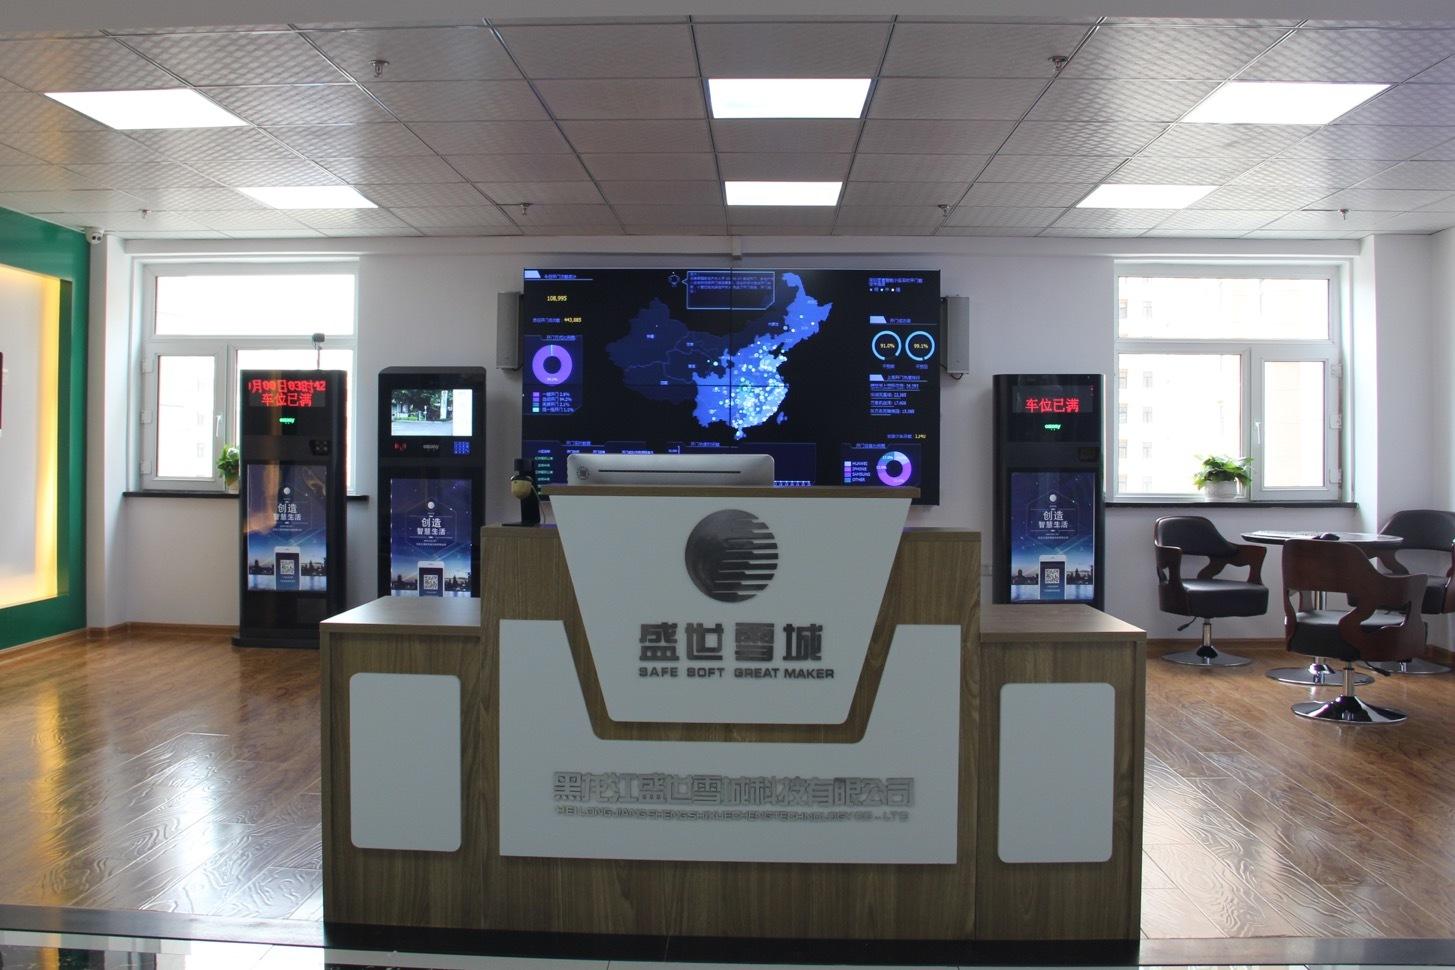 Heilong Jiang Shengshi Syracuse Technology Co., Ltd.